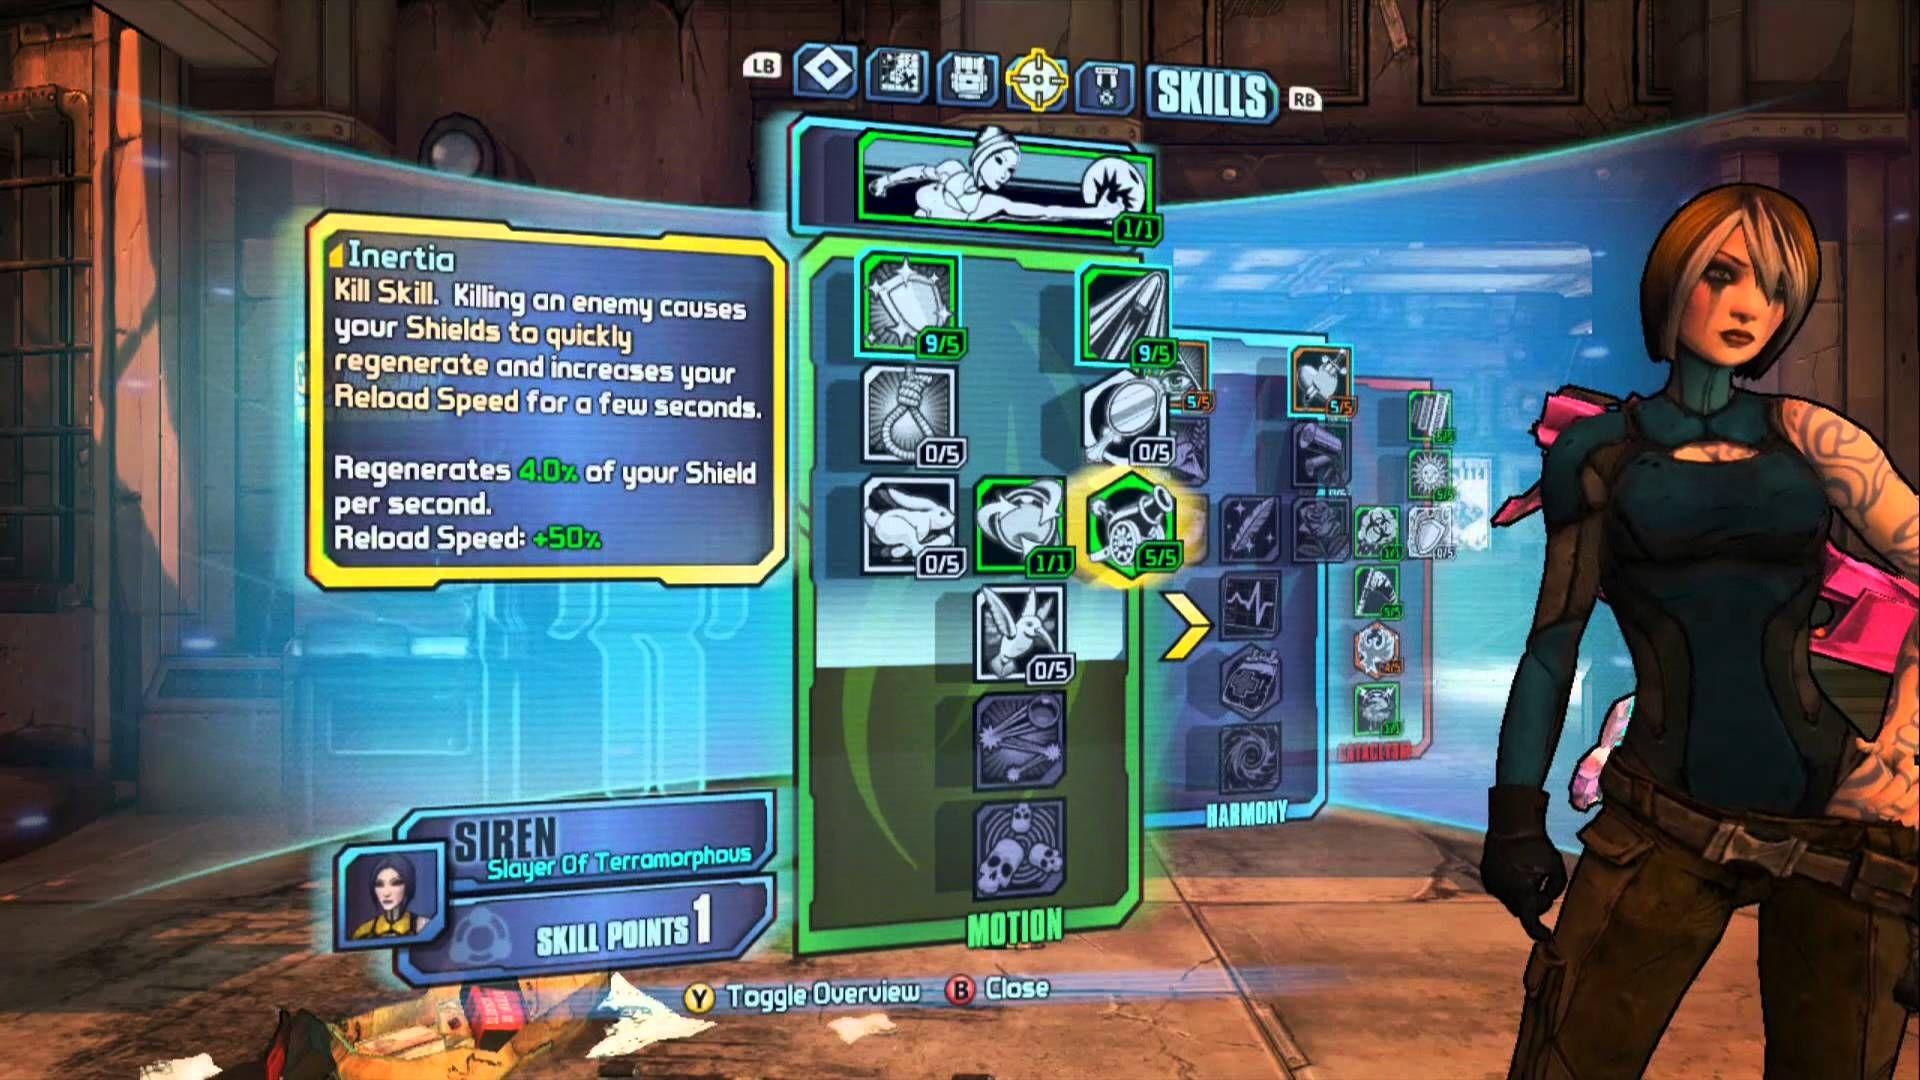 Borderlands 2 skills menu   Electronics DIY   Borderlands 2